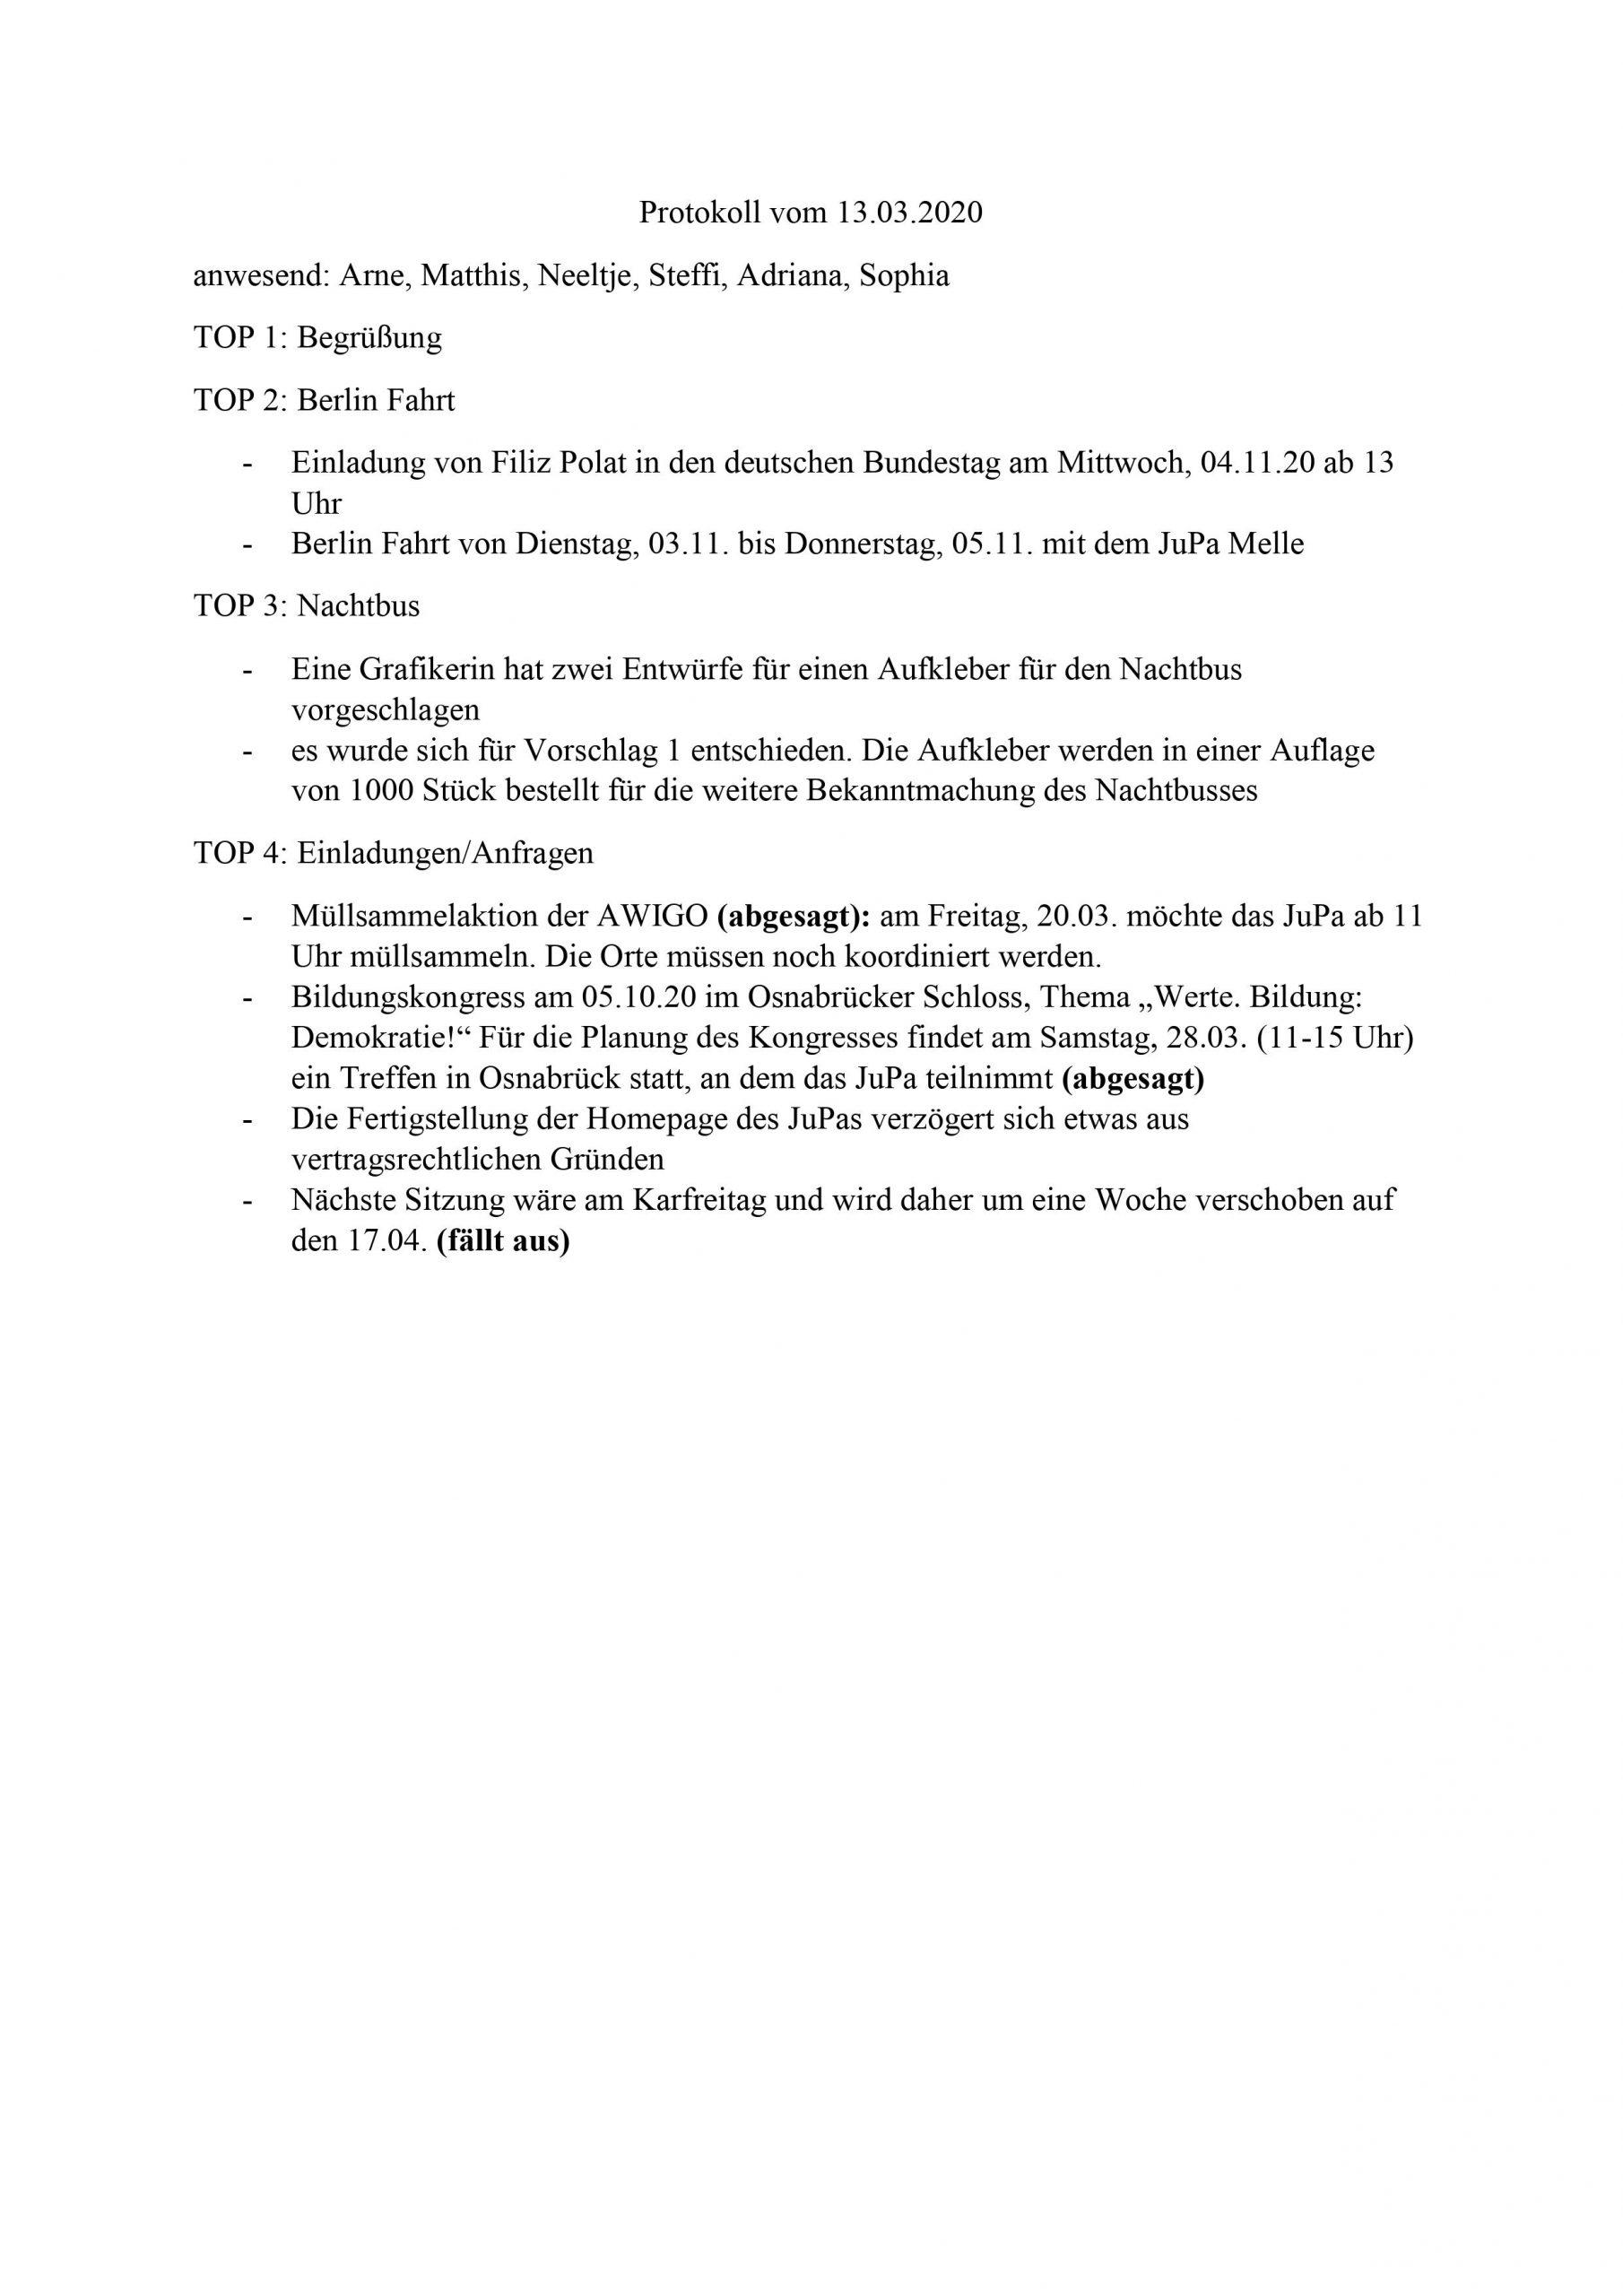 Protokoll Februar 2020 JuPa Bramsche